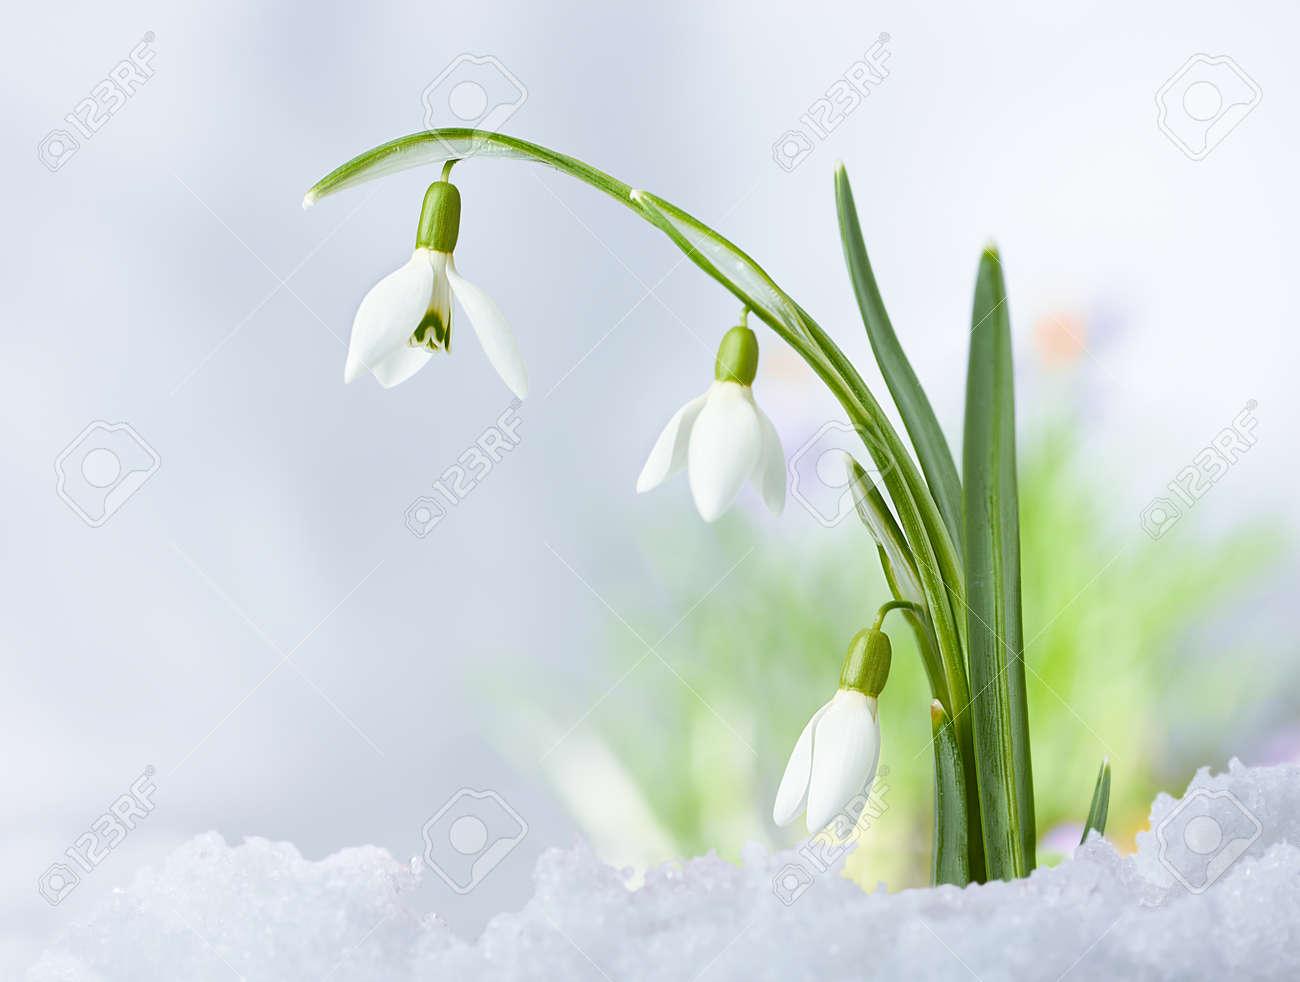 beautifull spring snowdrop flowers on snow background stock photo